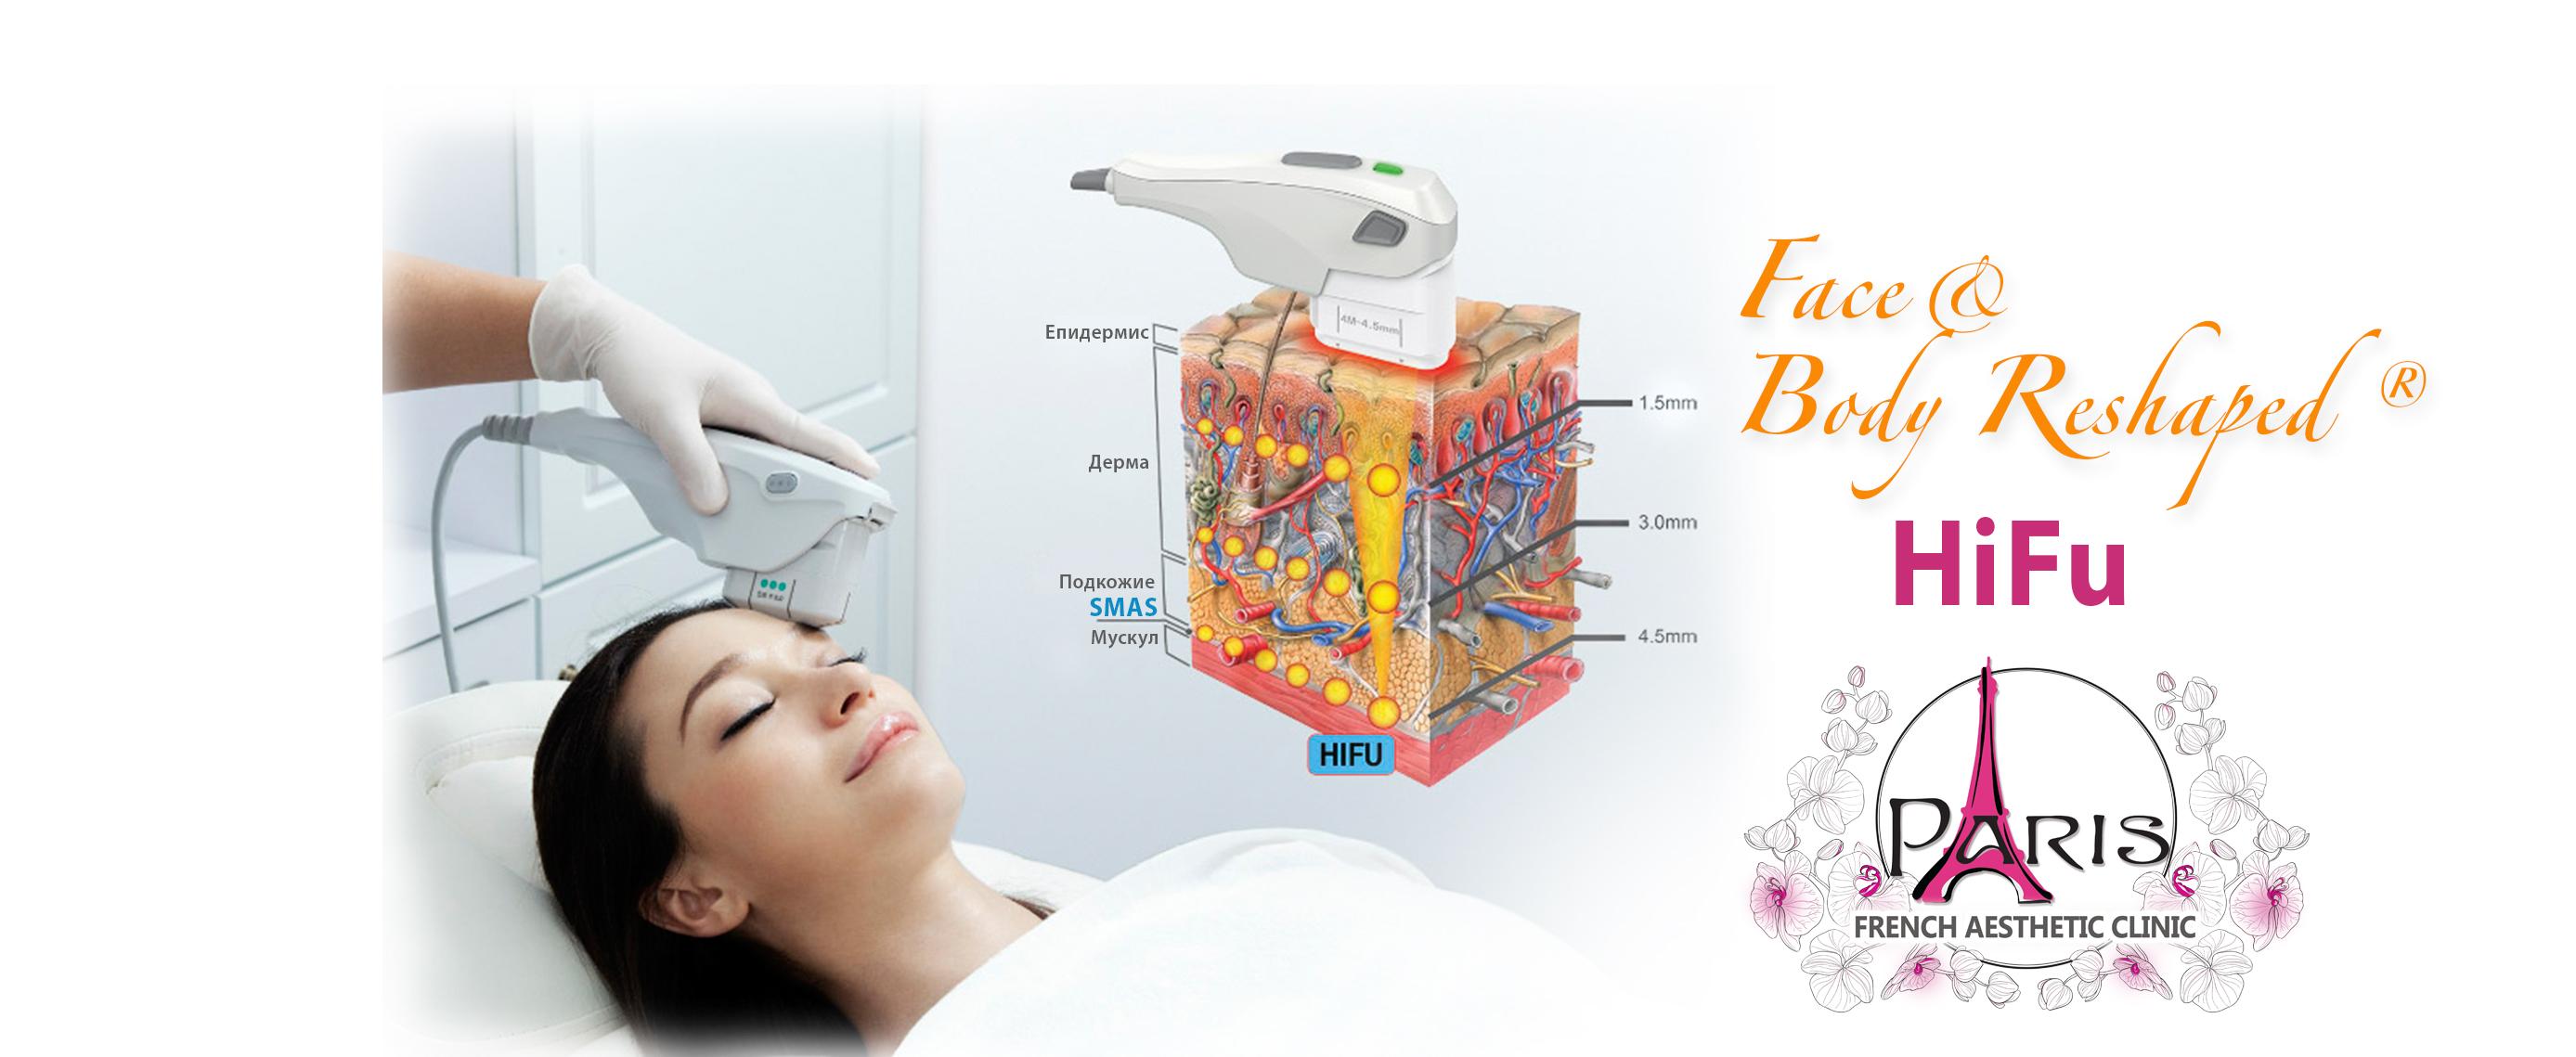 HIFU Face Reshaped® Висока технология – Наистина впечатляващи резултати!